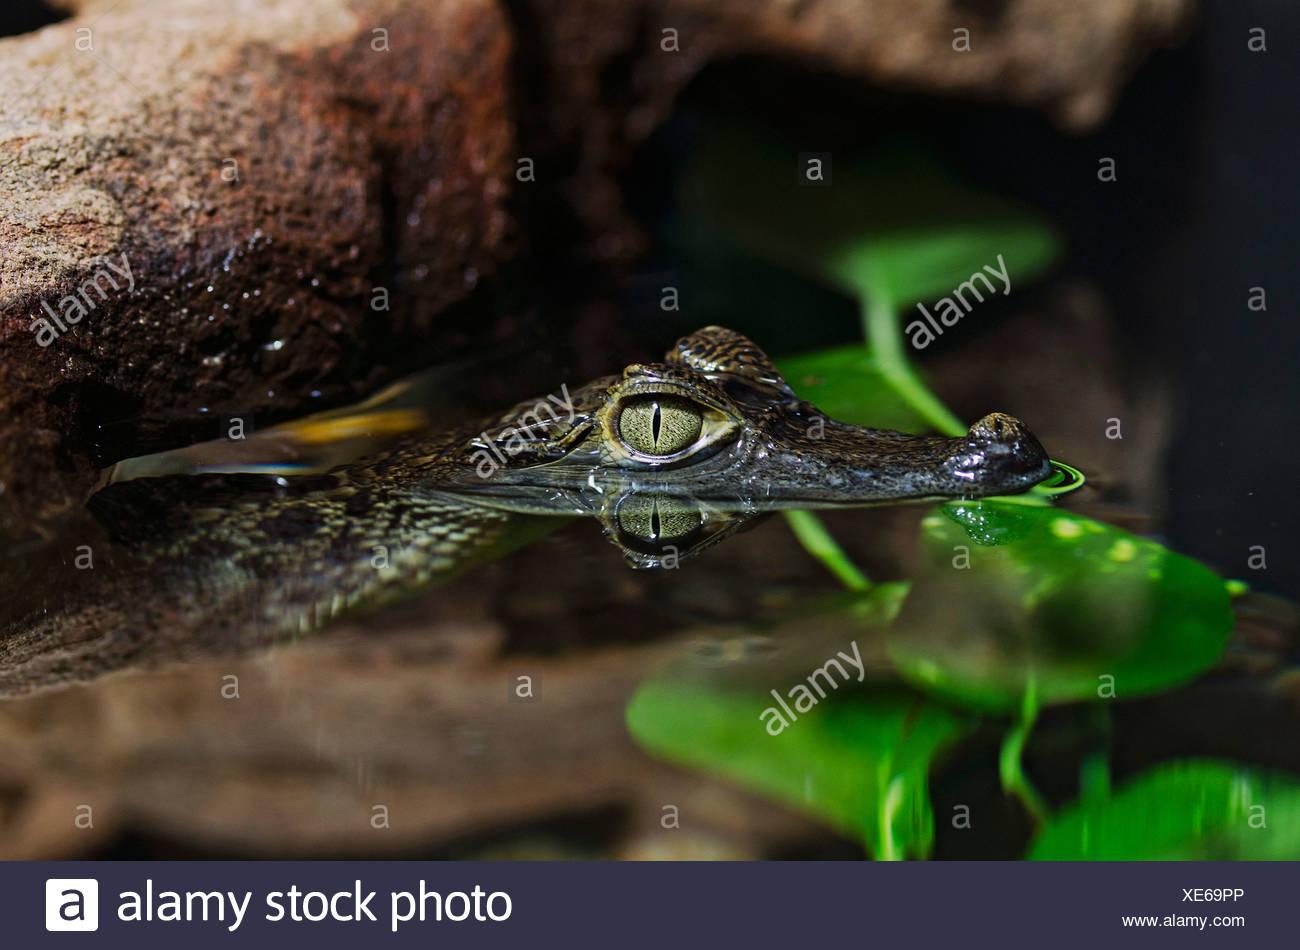 Young Spectacled Caiman, weiße Kaiman oder gemeinsame Kaiman (Caiman Crocodilus), Zoologischen Garten Berlin Zoo, Berlin Stockbild